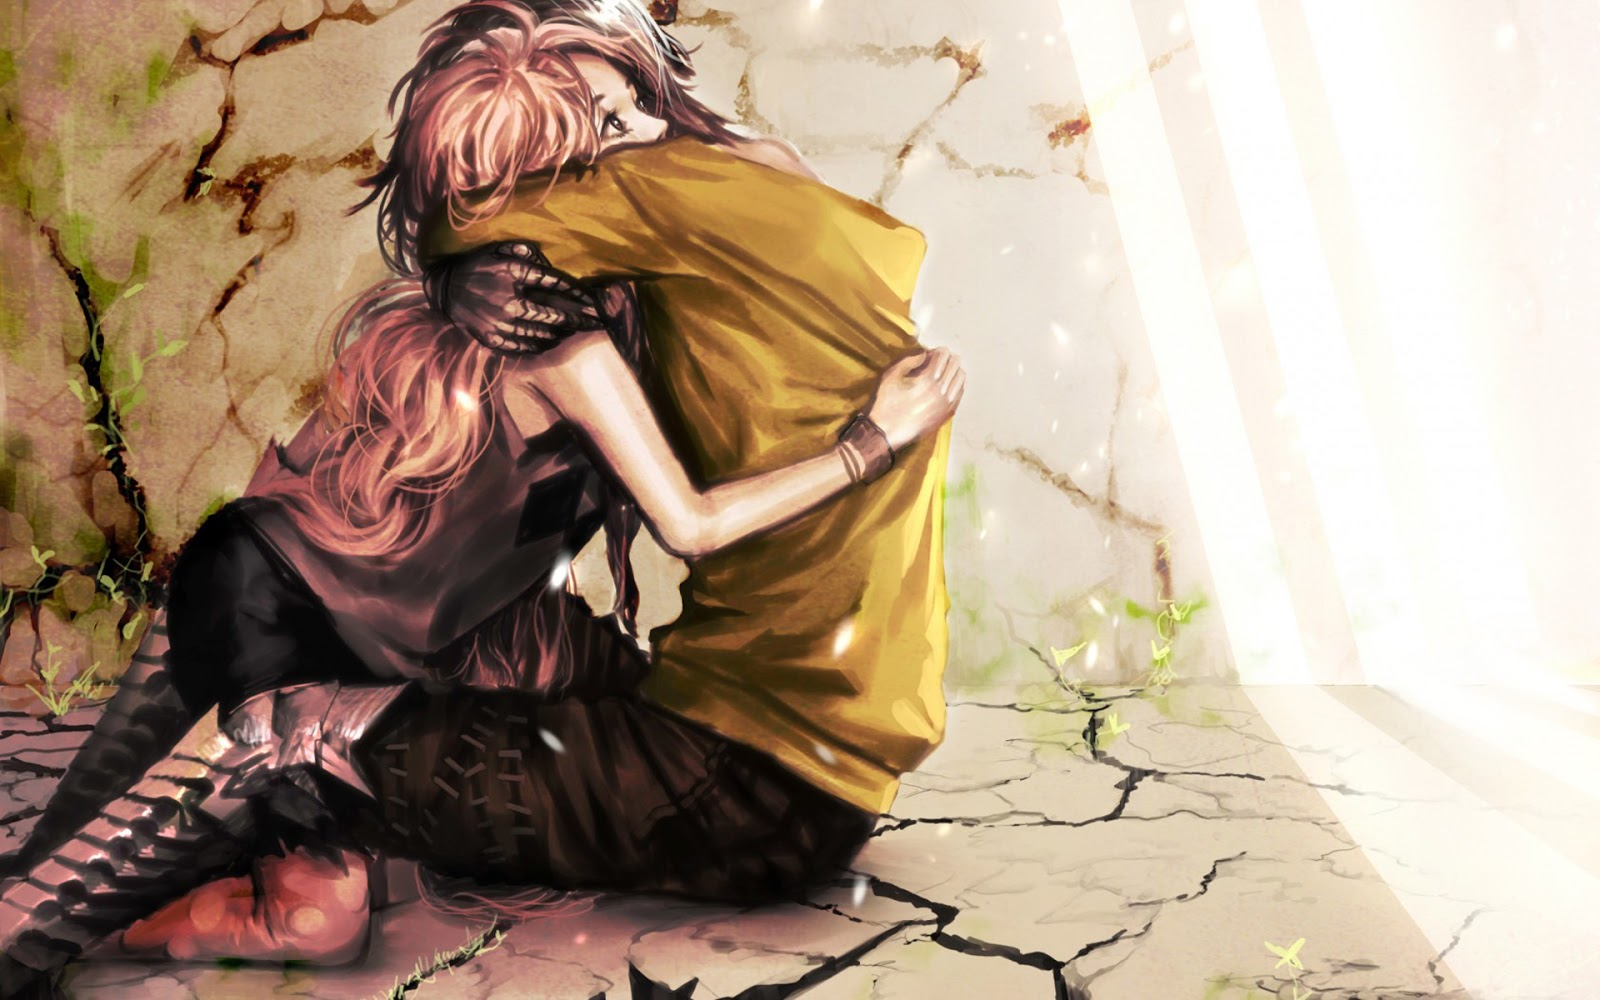 Anime Couple Girl Boy Hug HD Wallpaper Desktop PC Background 1600x1000